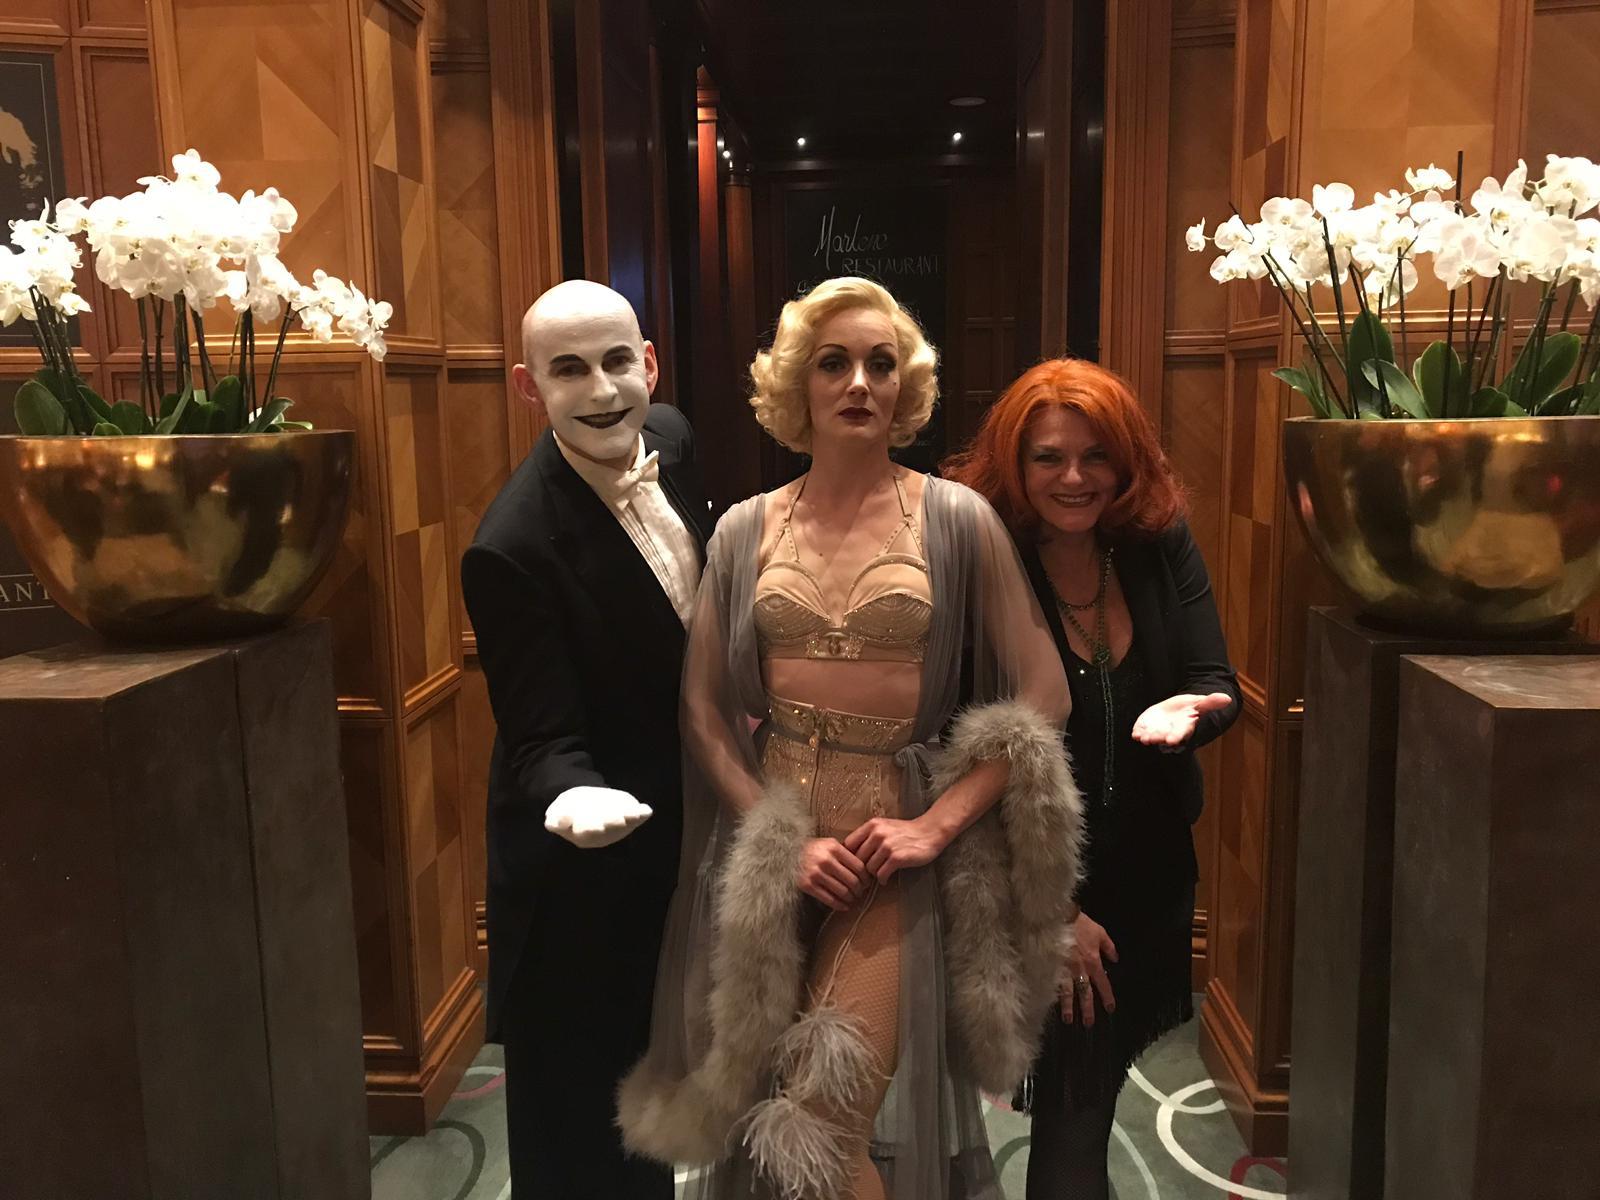 Cabaret Show Gala Venue Event Entertainment in the Interconti Hotel